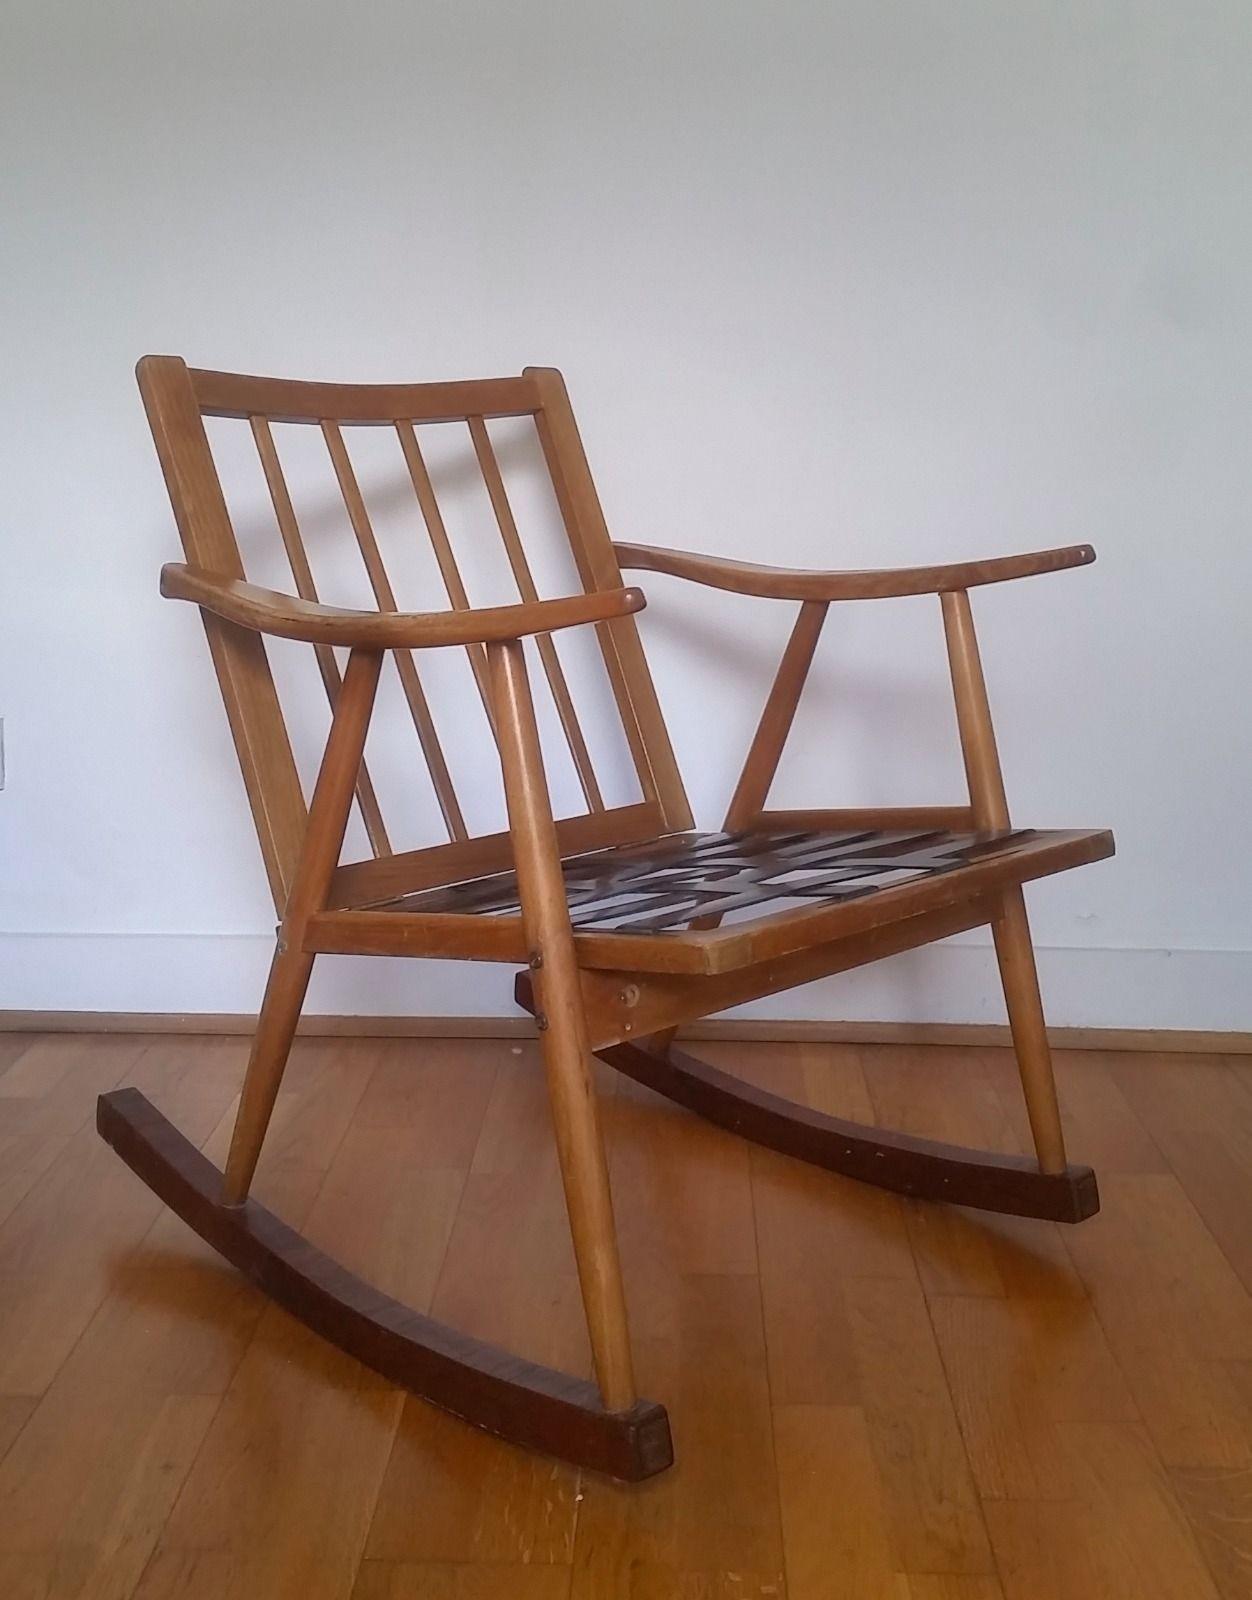 Bender Unit22 Tarafindan Chairs Panosundaki Fikir Koltuklar